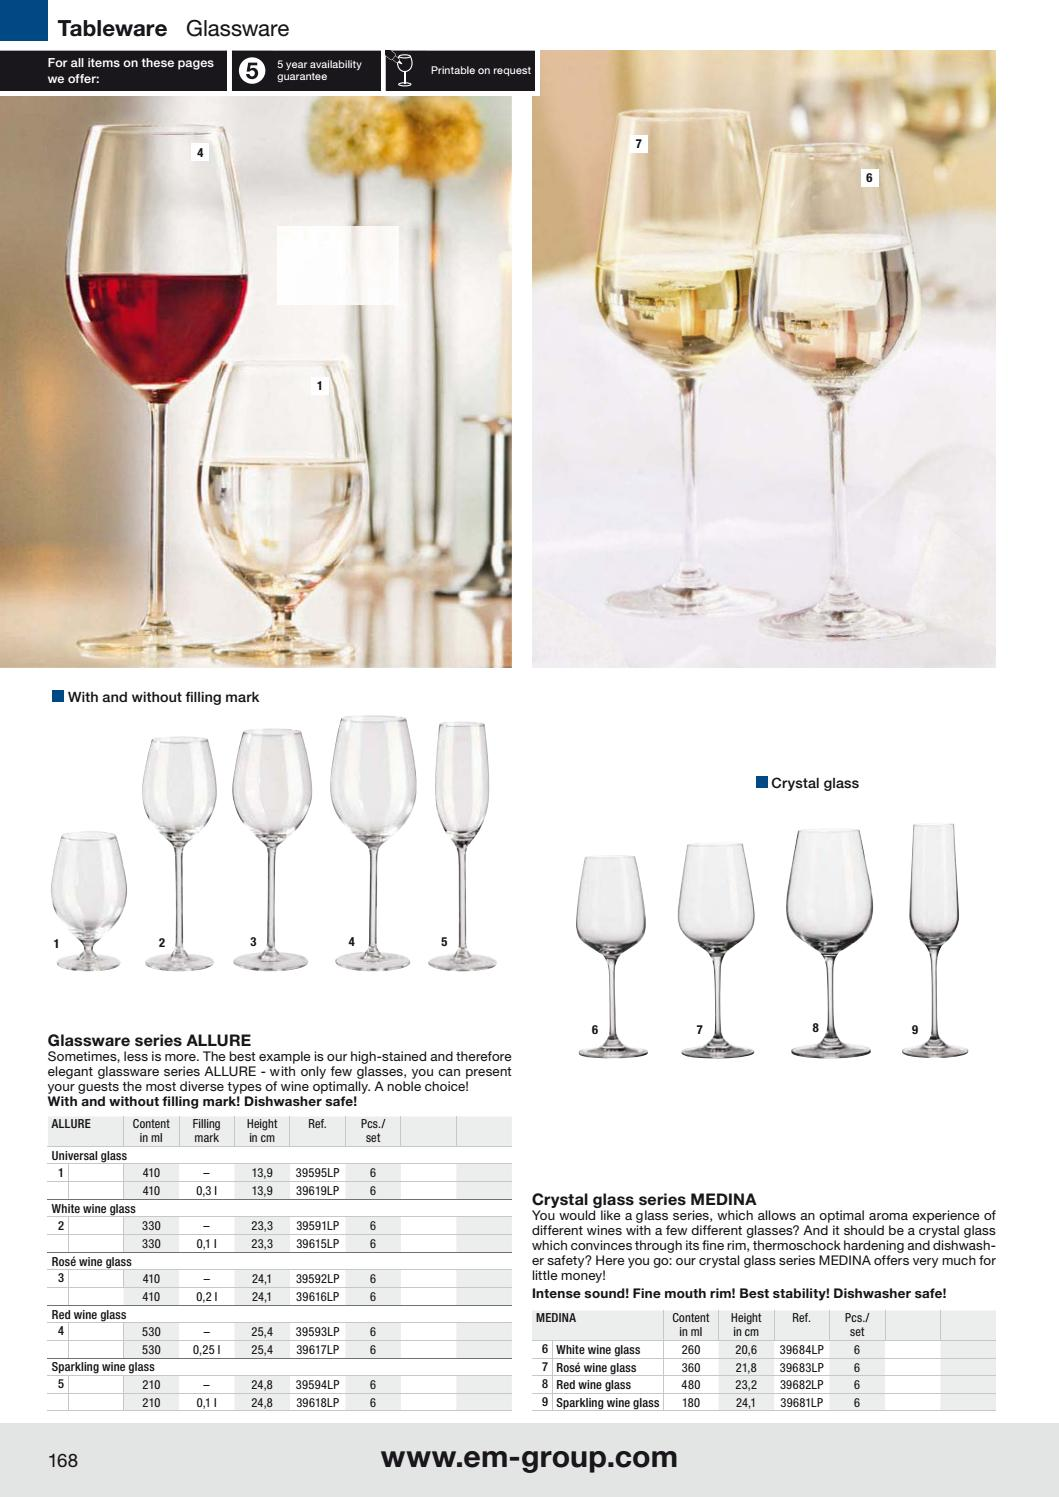 image about Printable Glassware titled Katalog VEGA 2017 - wyposażenie dla gastronomii, hoteli oraz